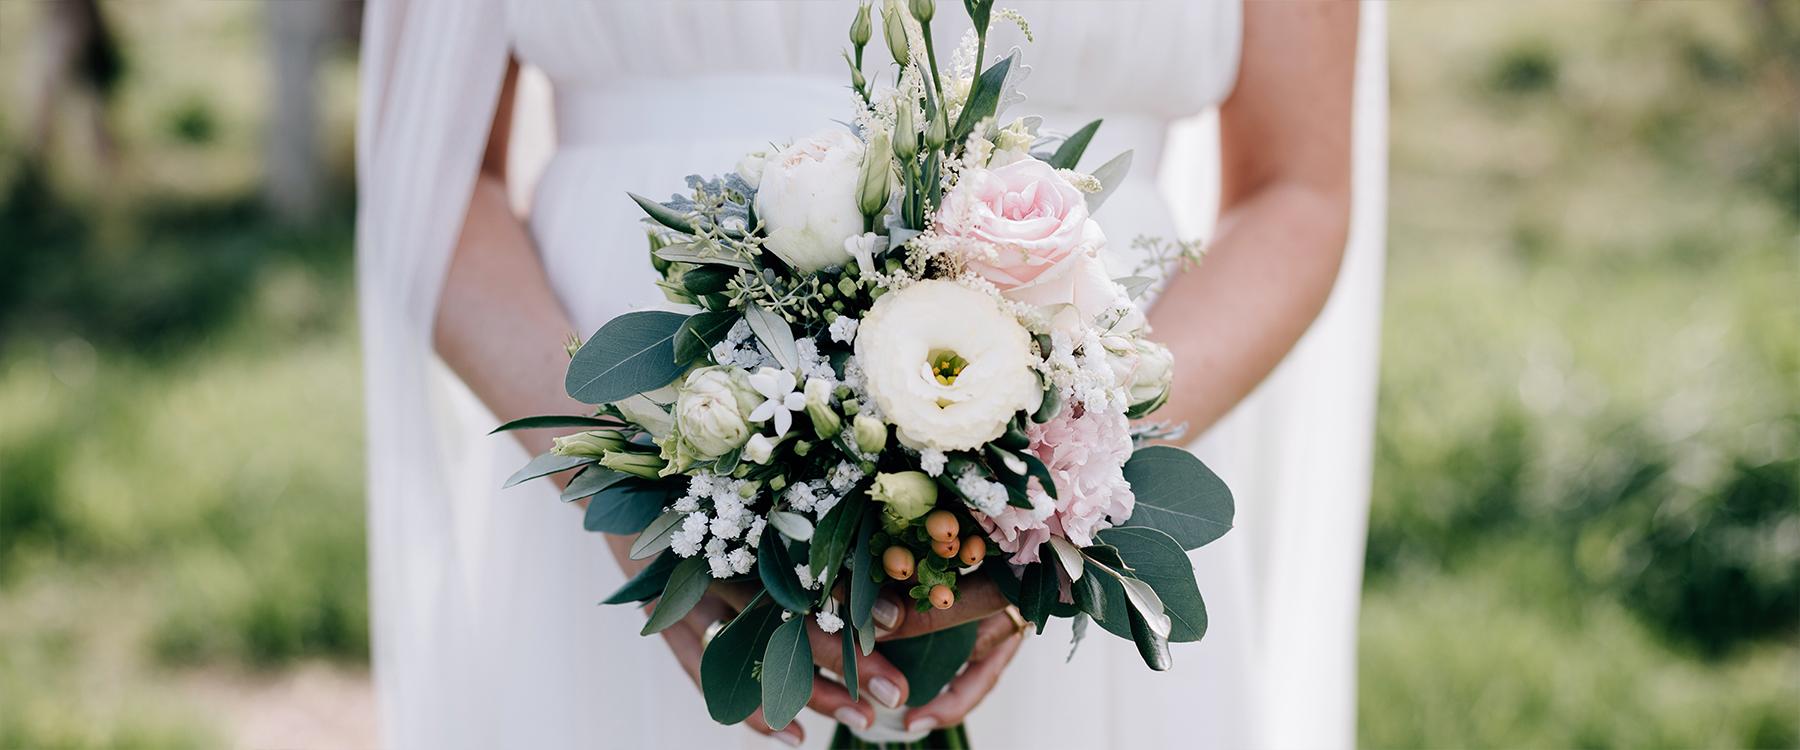 wedding-fotos-cinema-alenaalex-239.jpg